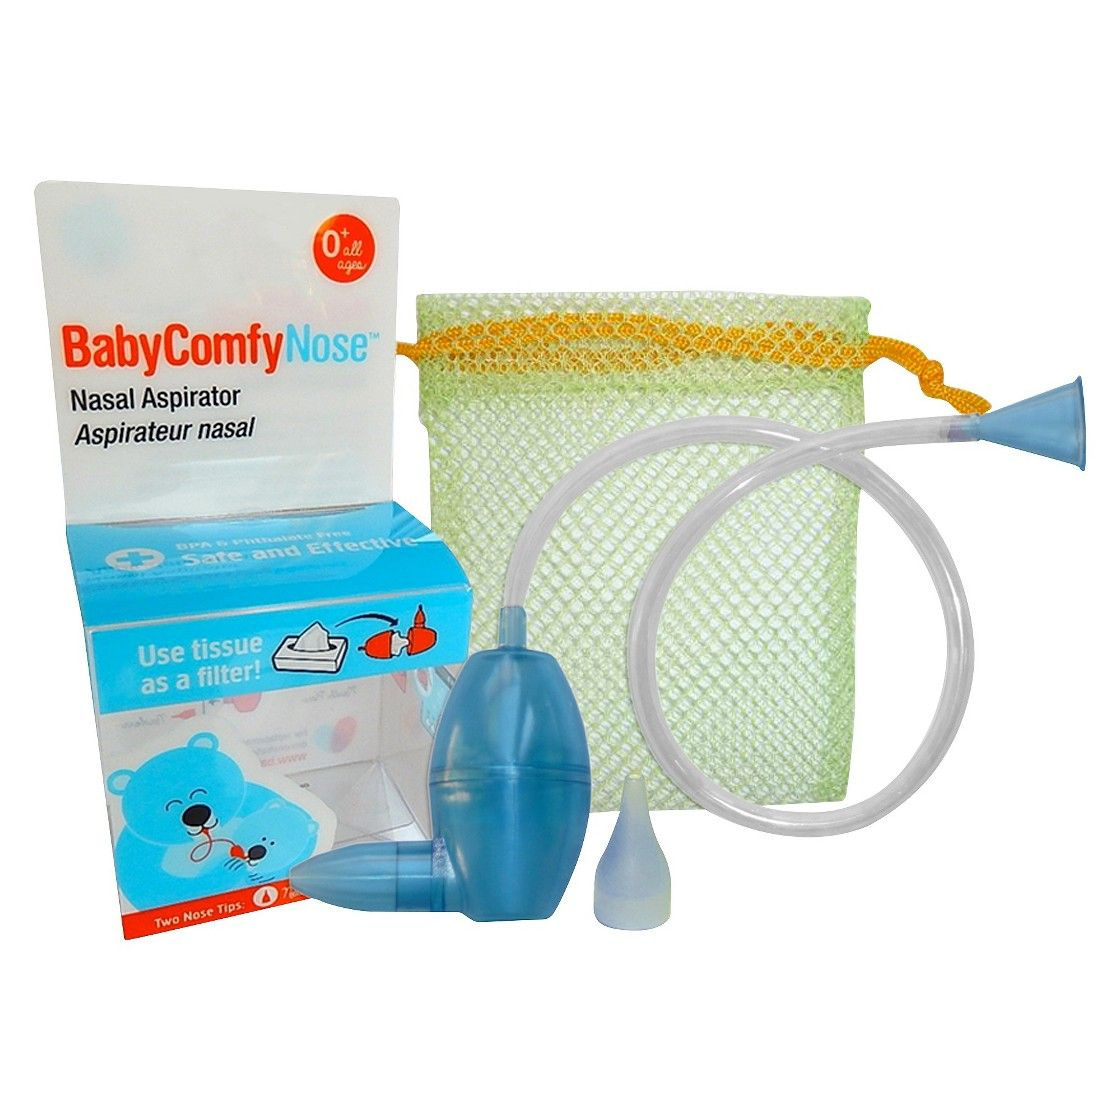 Baby comfy nose nasal aspirator nasal aspirator nose